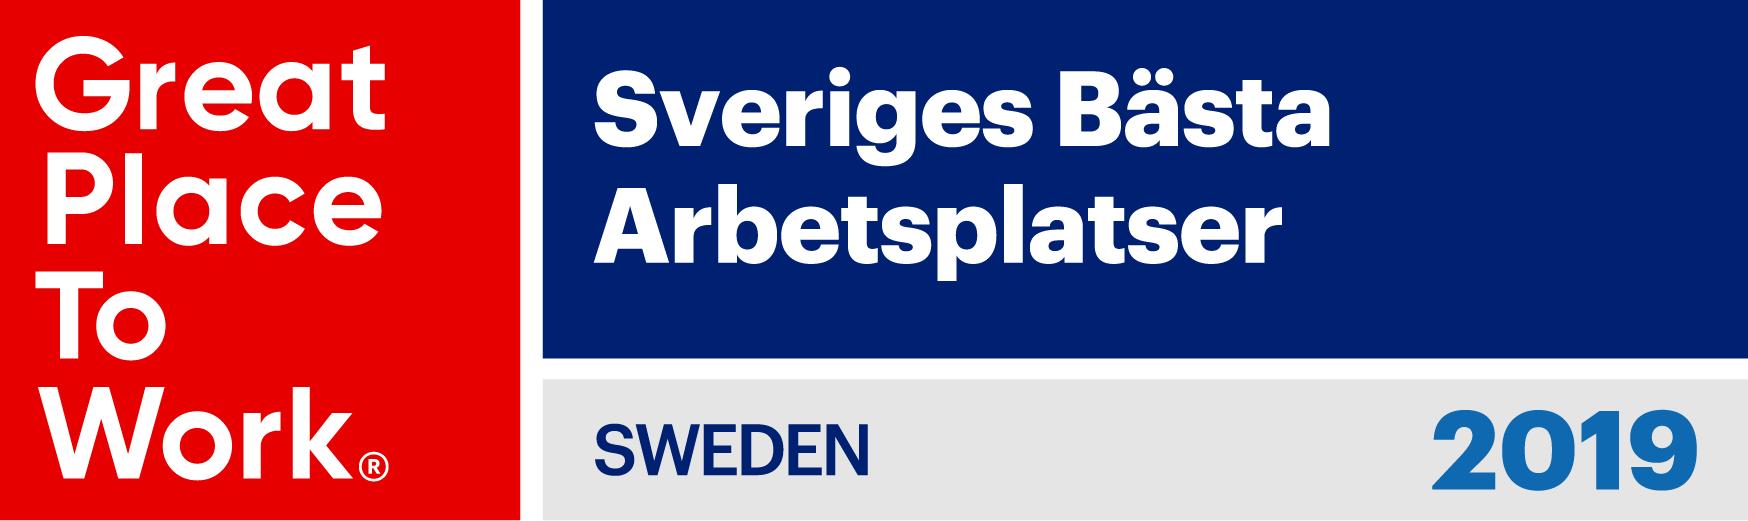 SBA2019_Sweden_RGB_SE